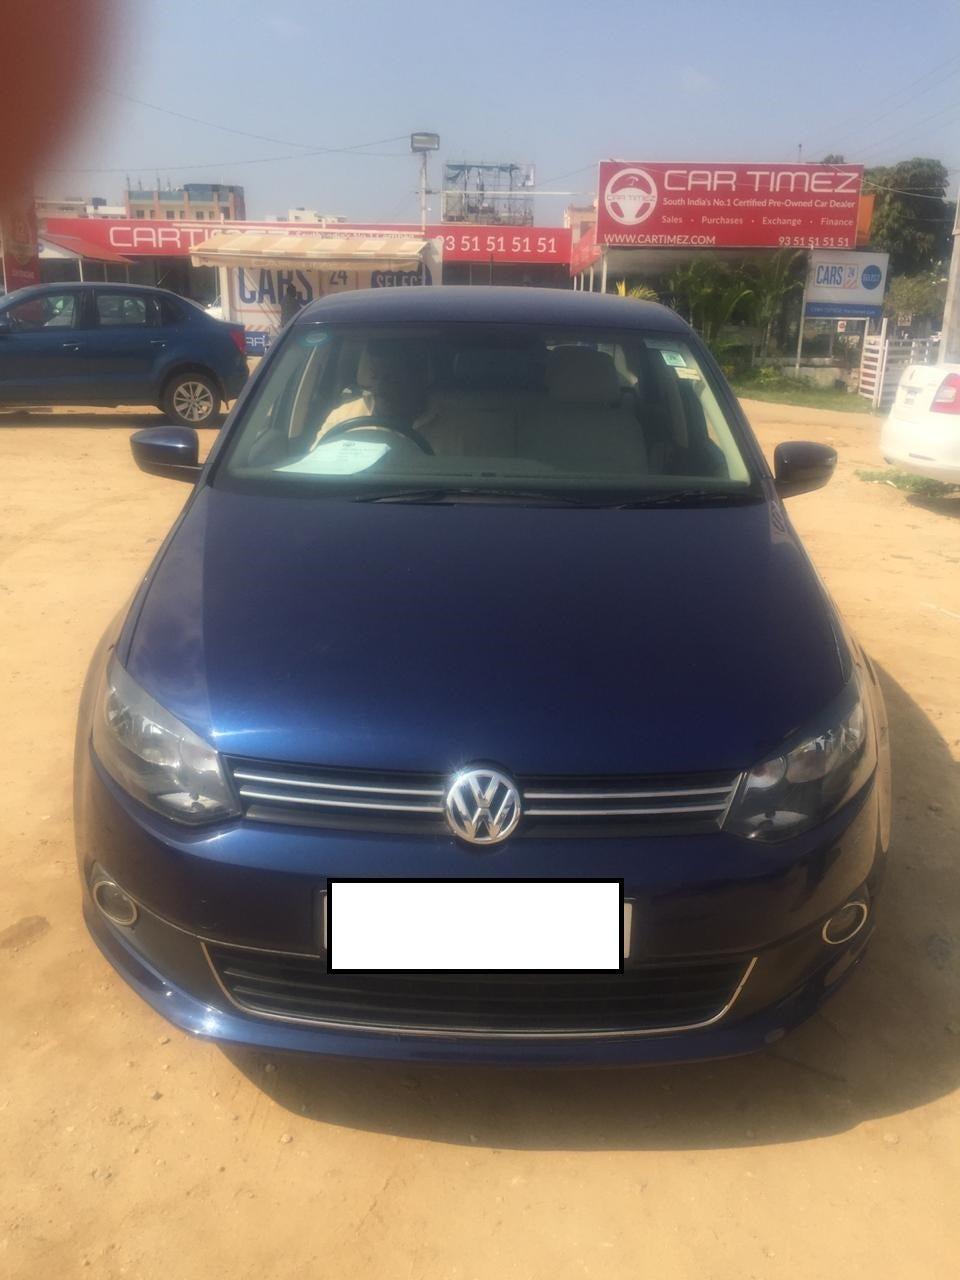 Buy Used Volkswagen Vento In Hyderabad Cars24